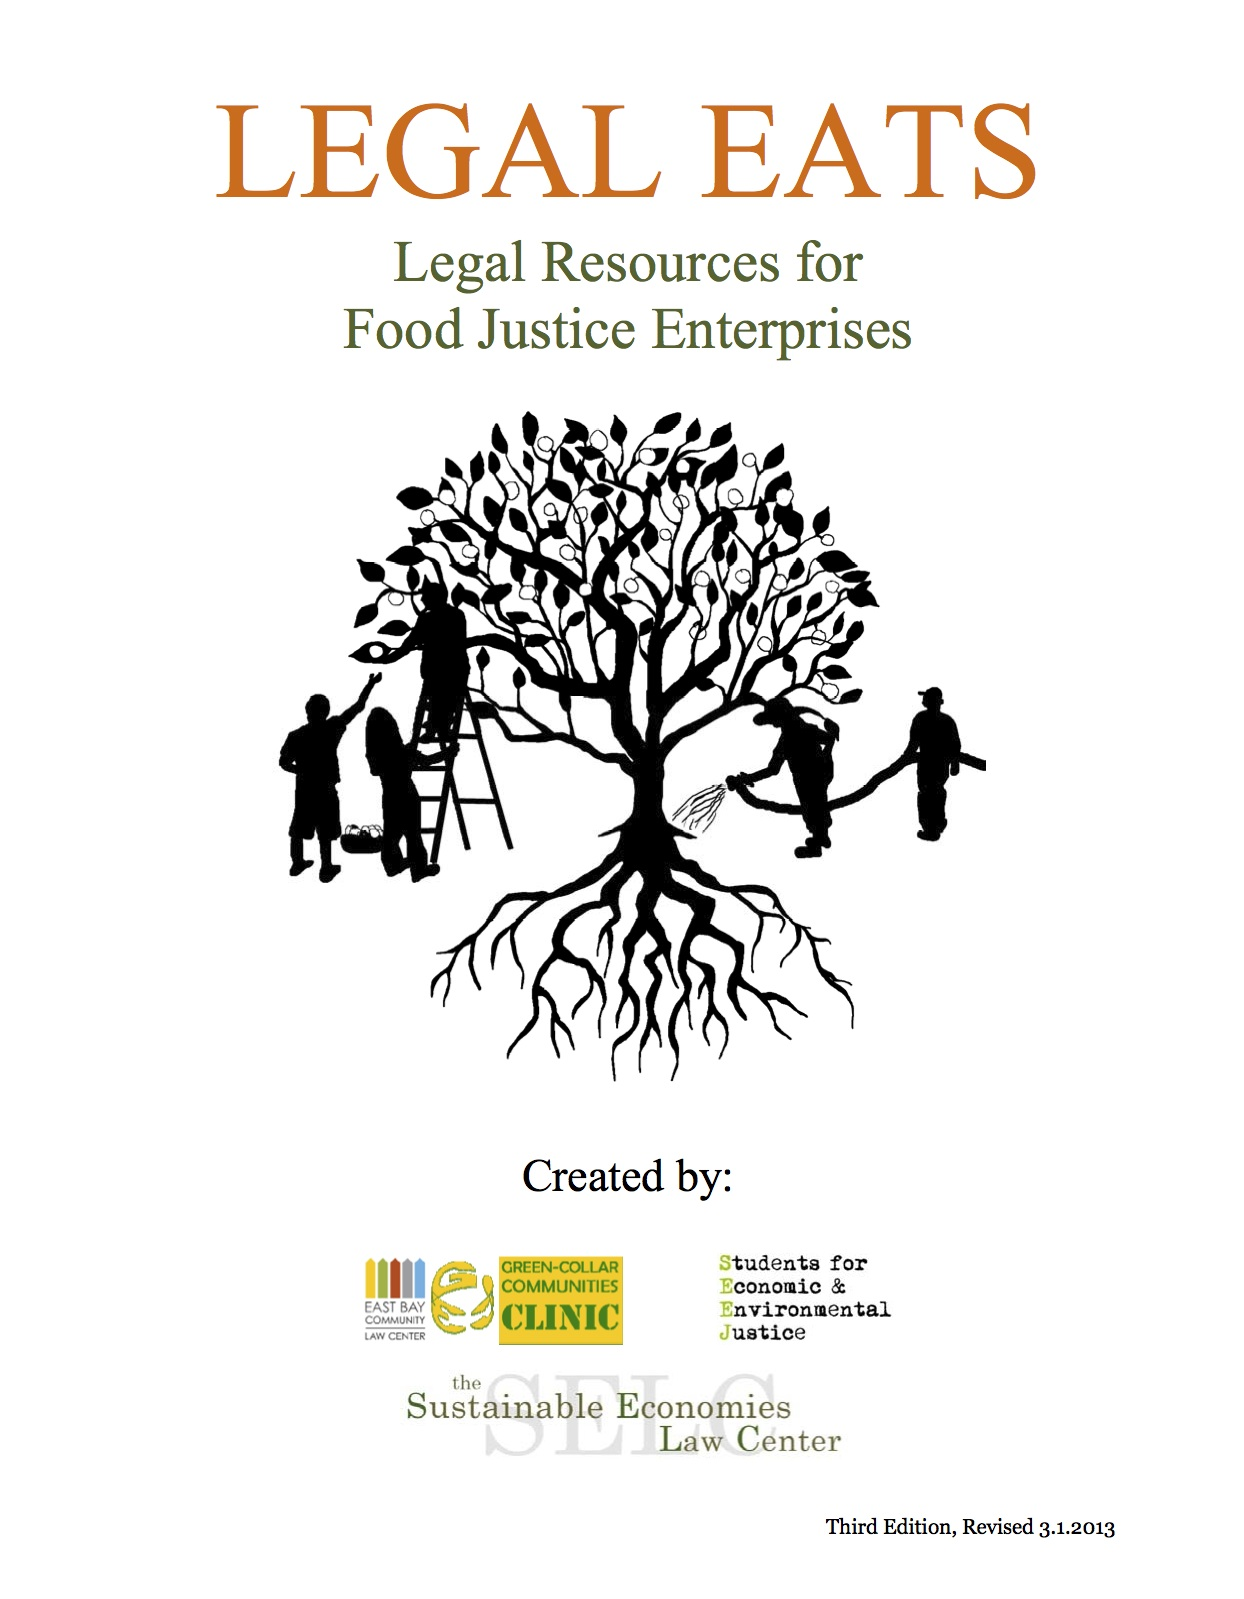 Legal-Eats-Handbook-Cover.jpg